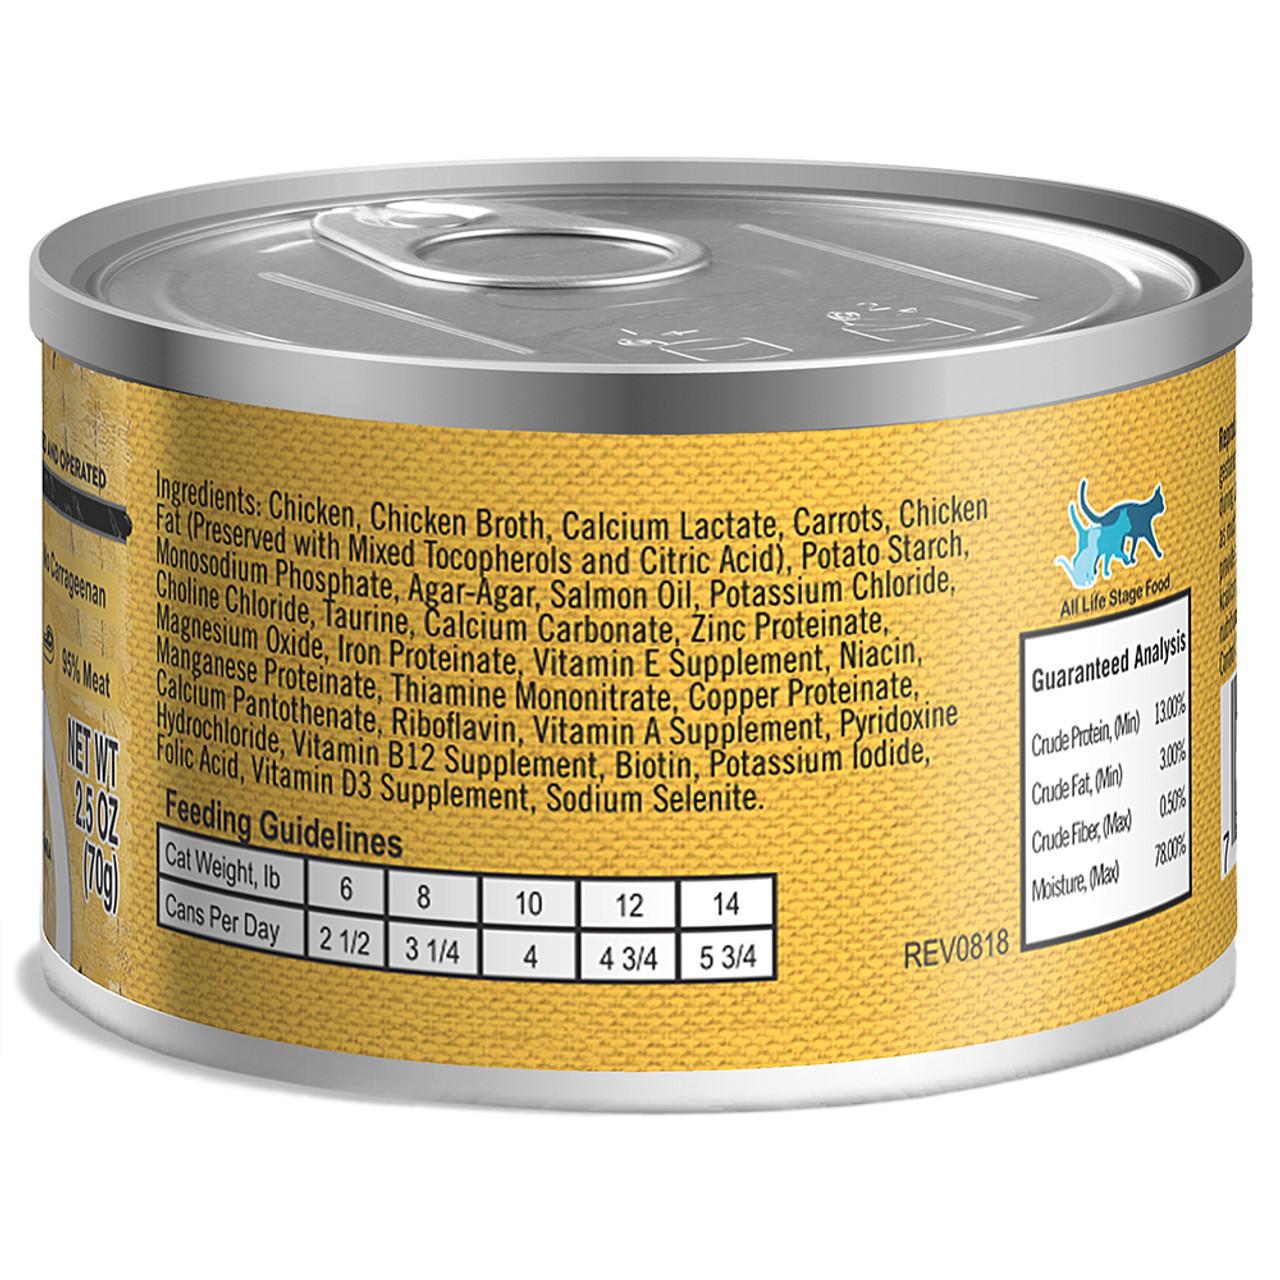 Lotus Just Juicy Chicken Stew Recipe Grain-Free Canned Cat Food